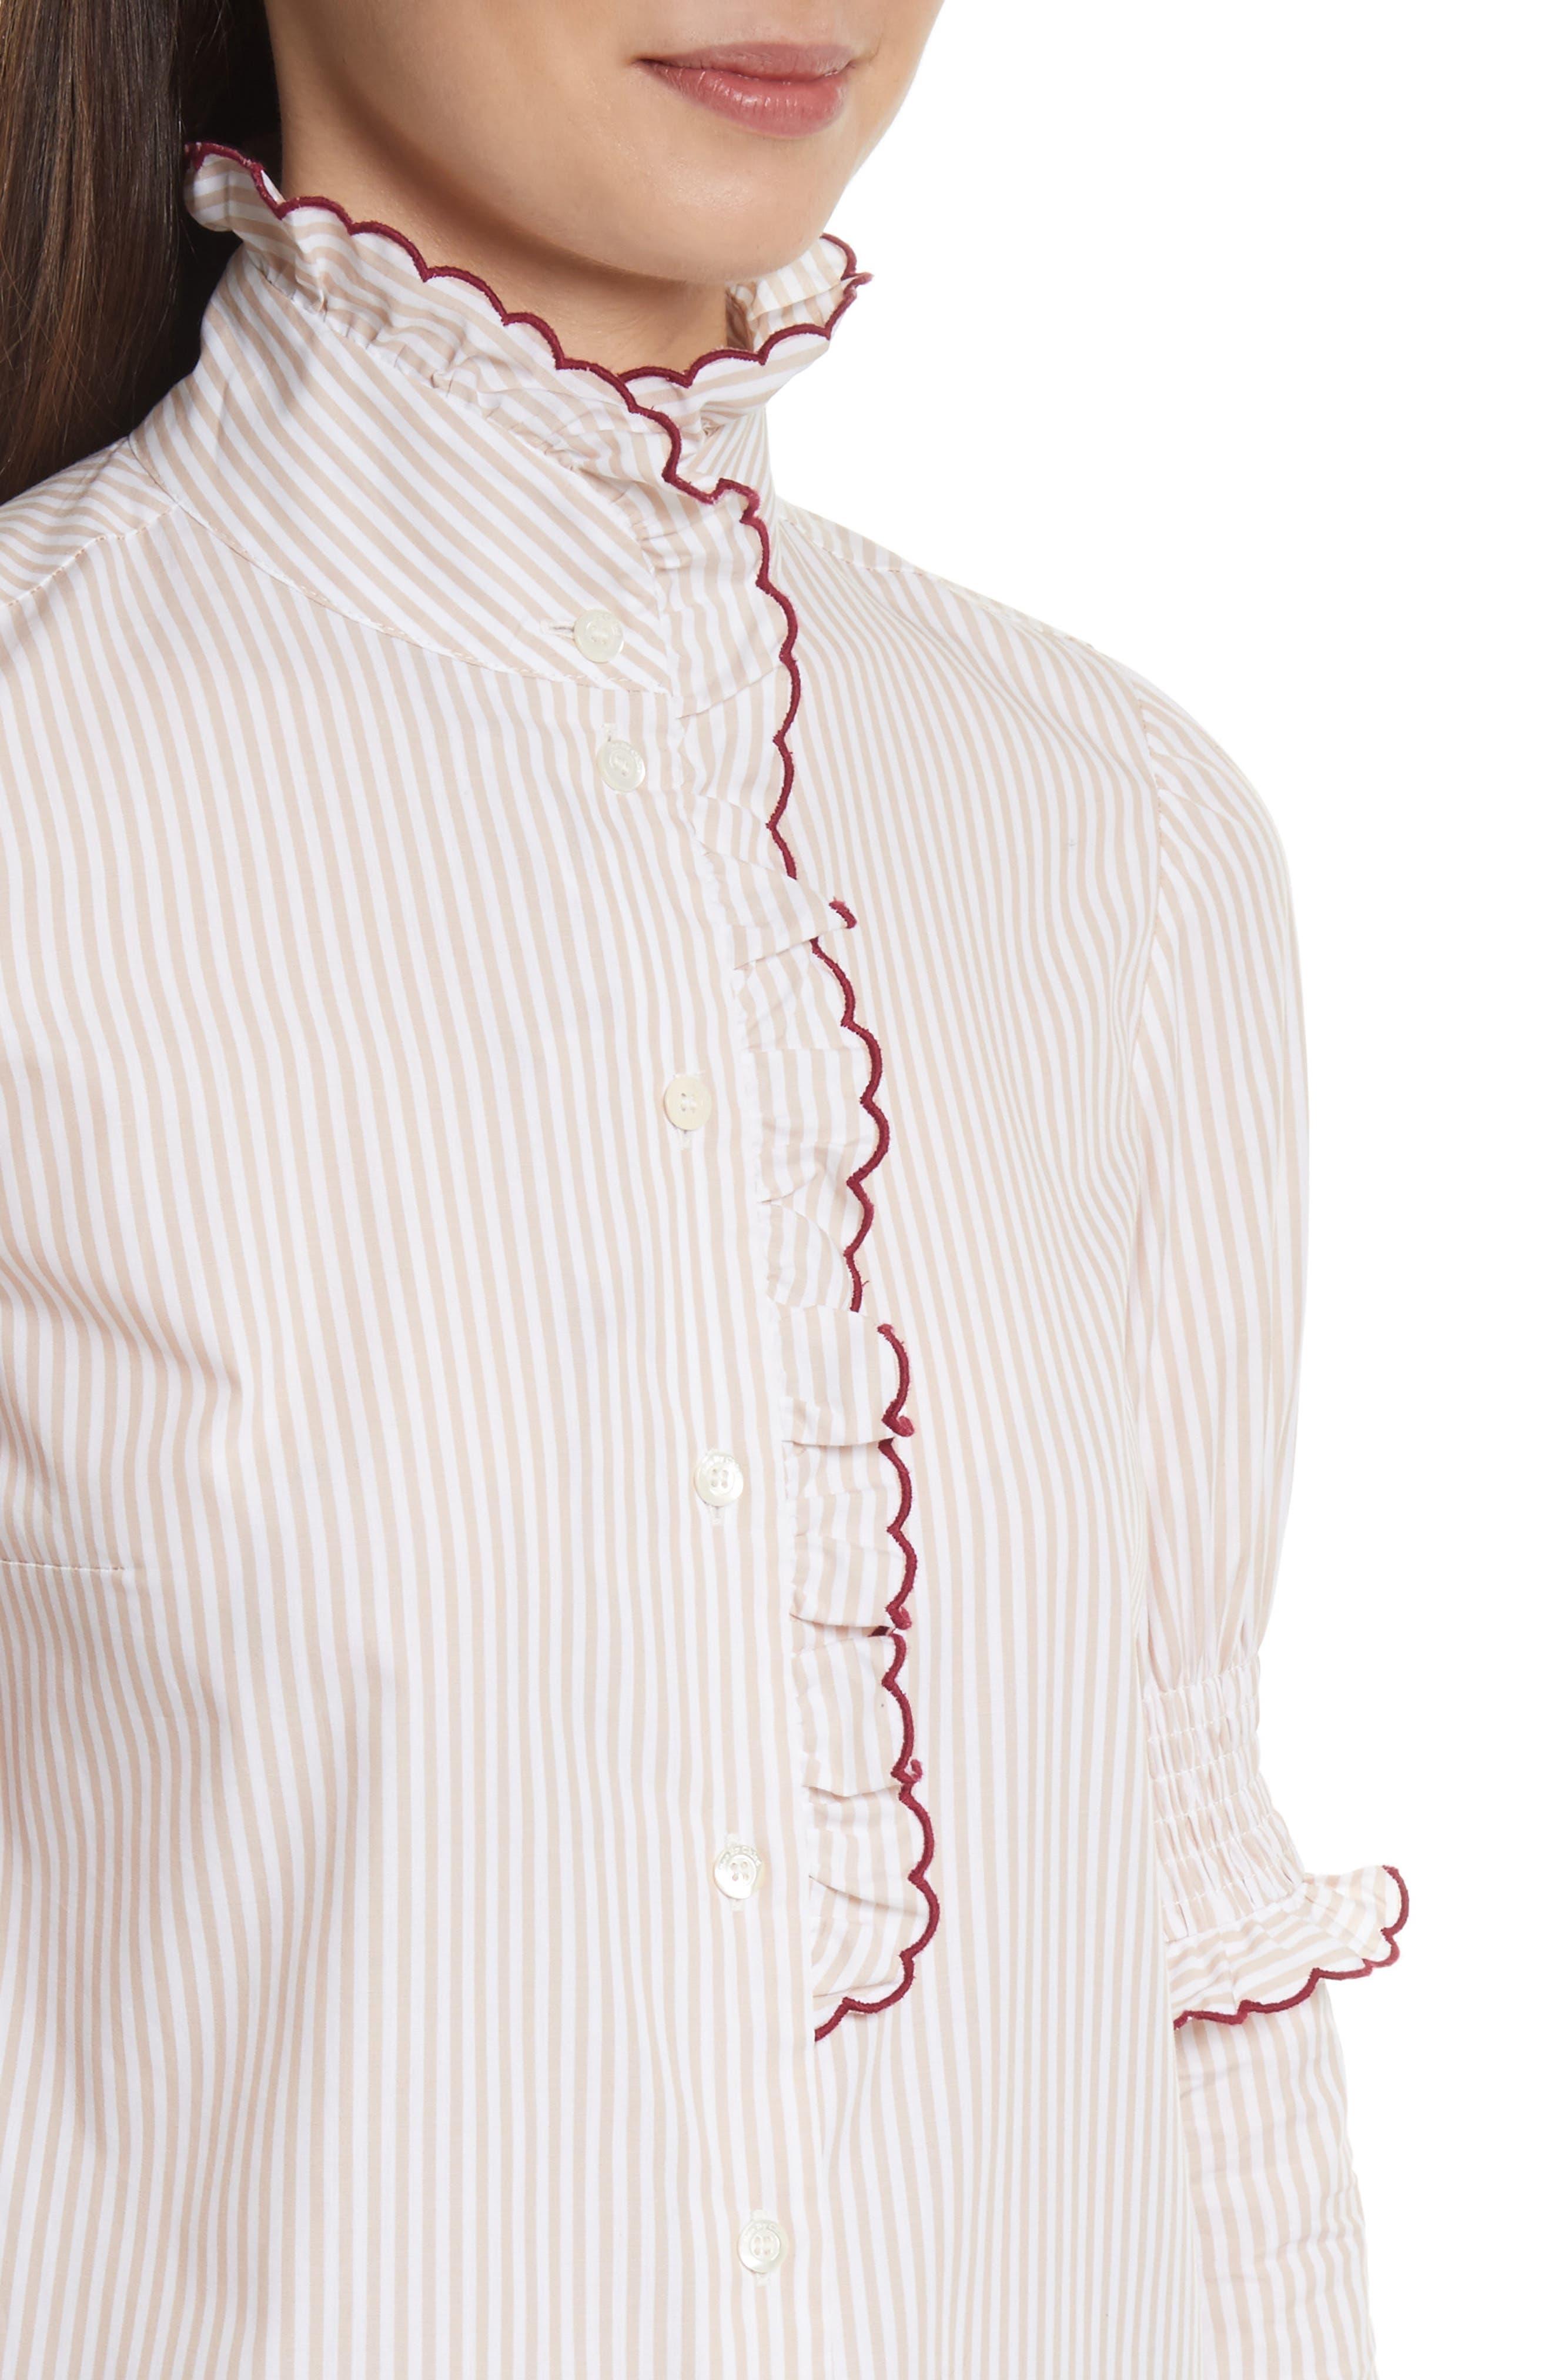 Stripe Cotton Shirt,                             Alternate thumbnail 4, color,                             Beige-White